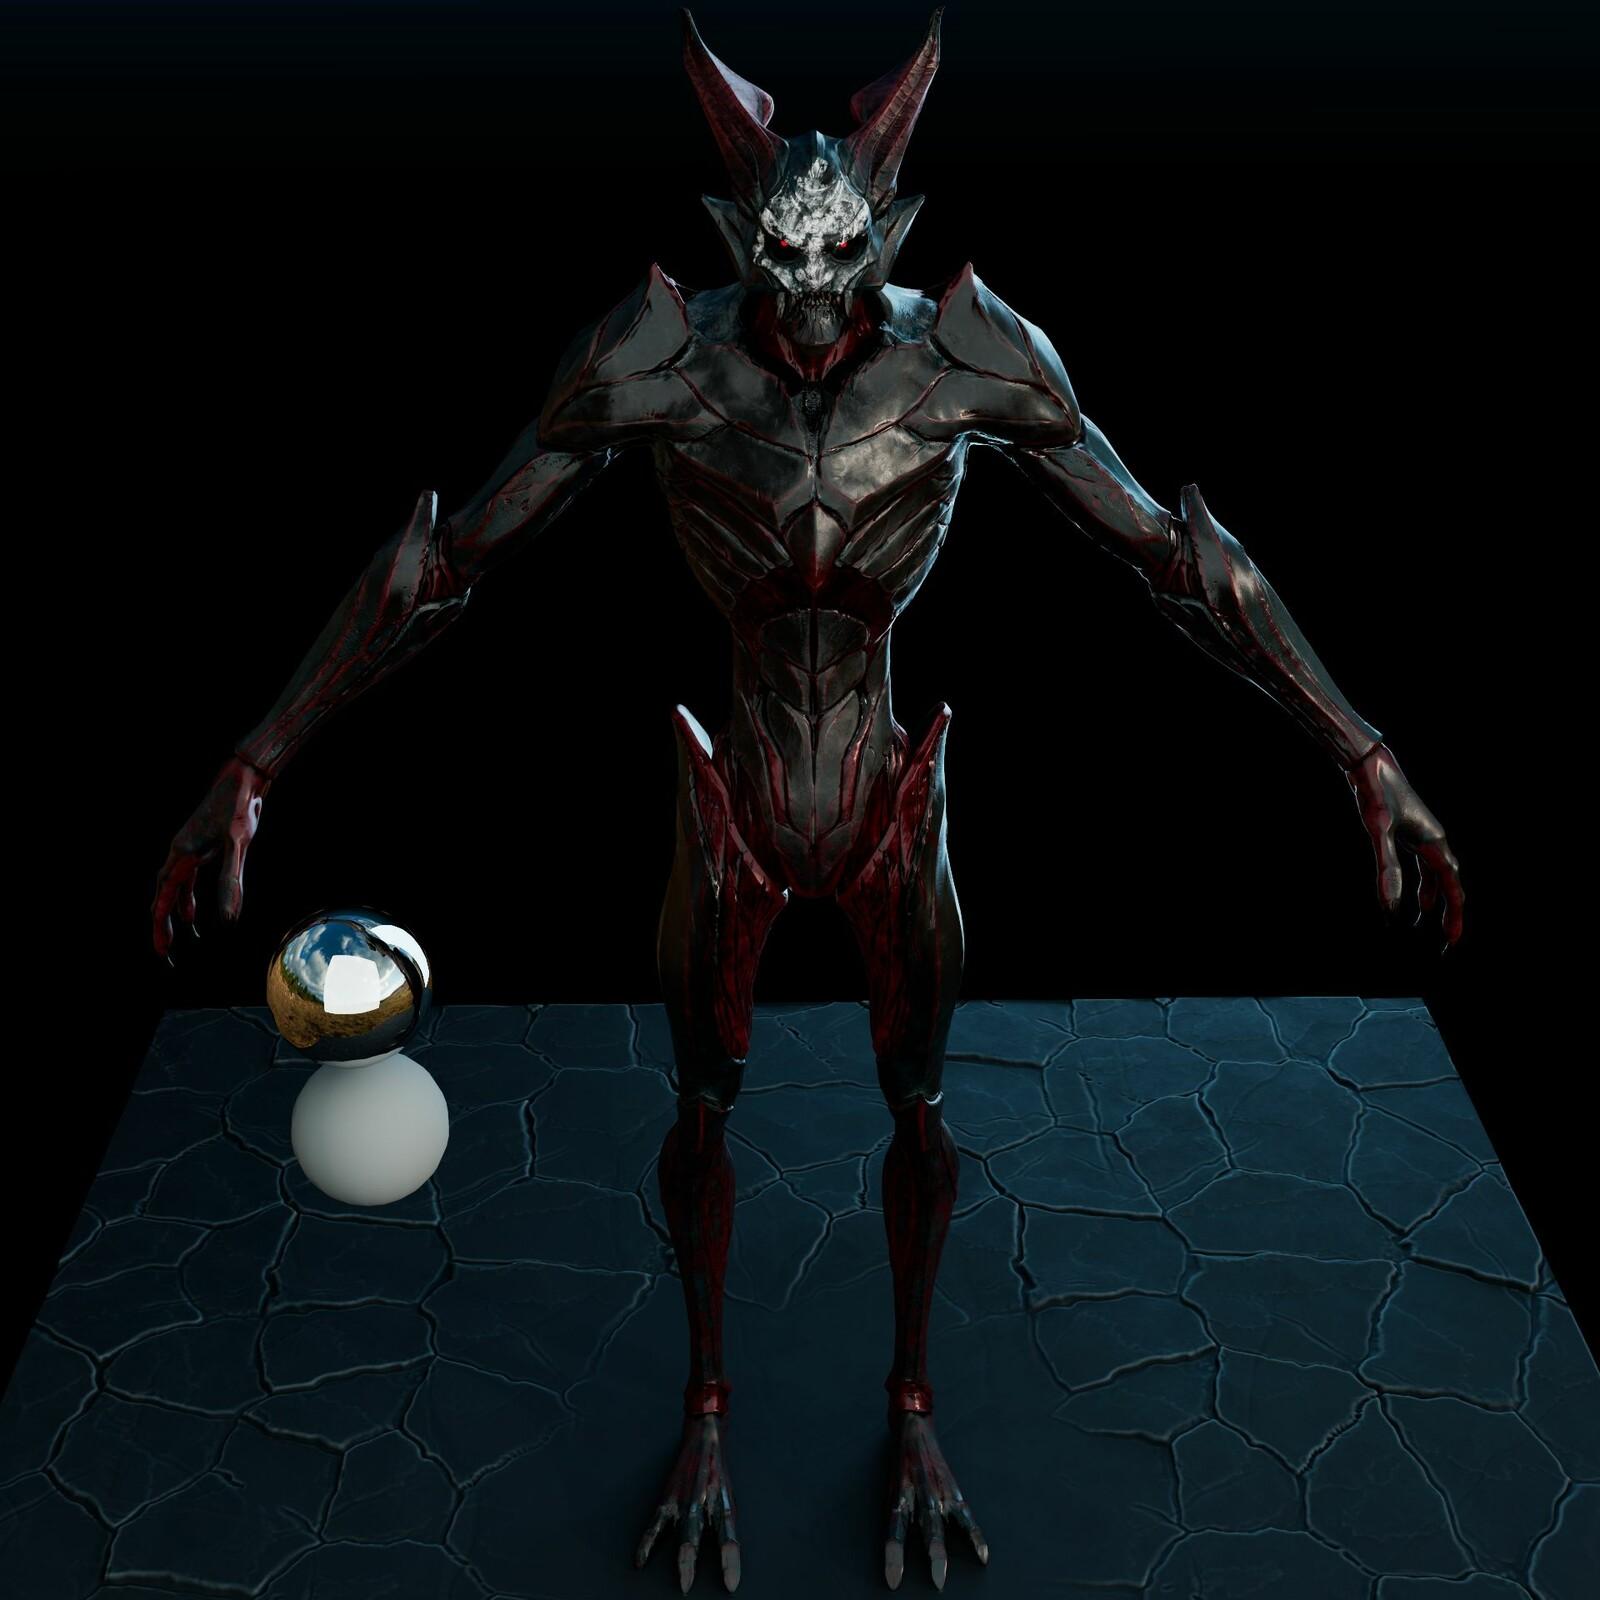 The Final demon Texture (WarPaint Variation)